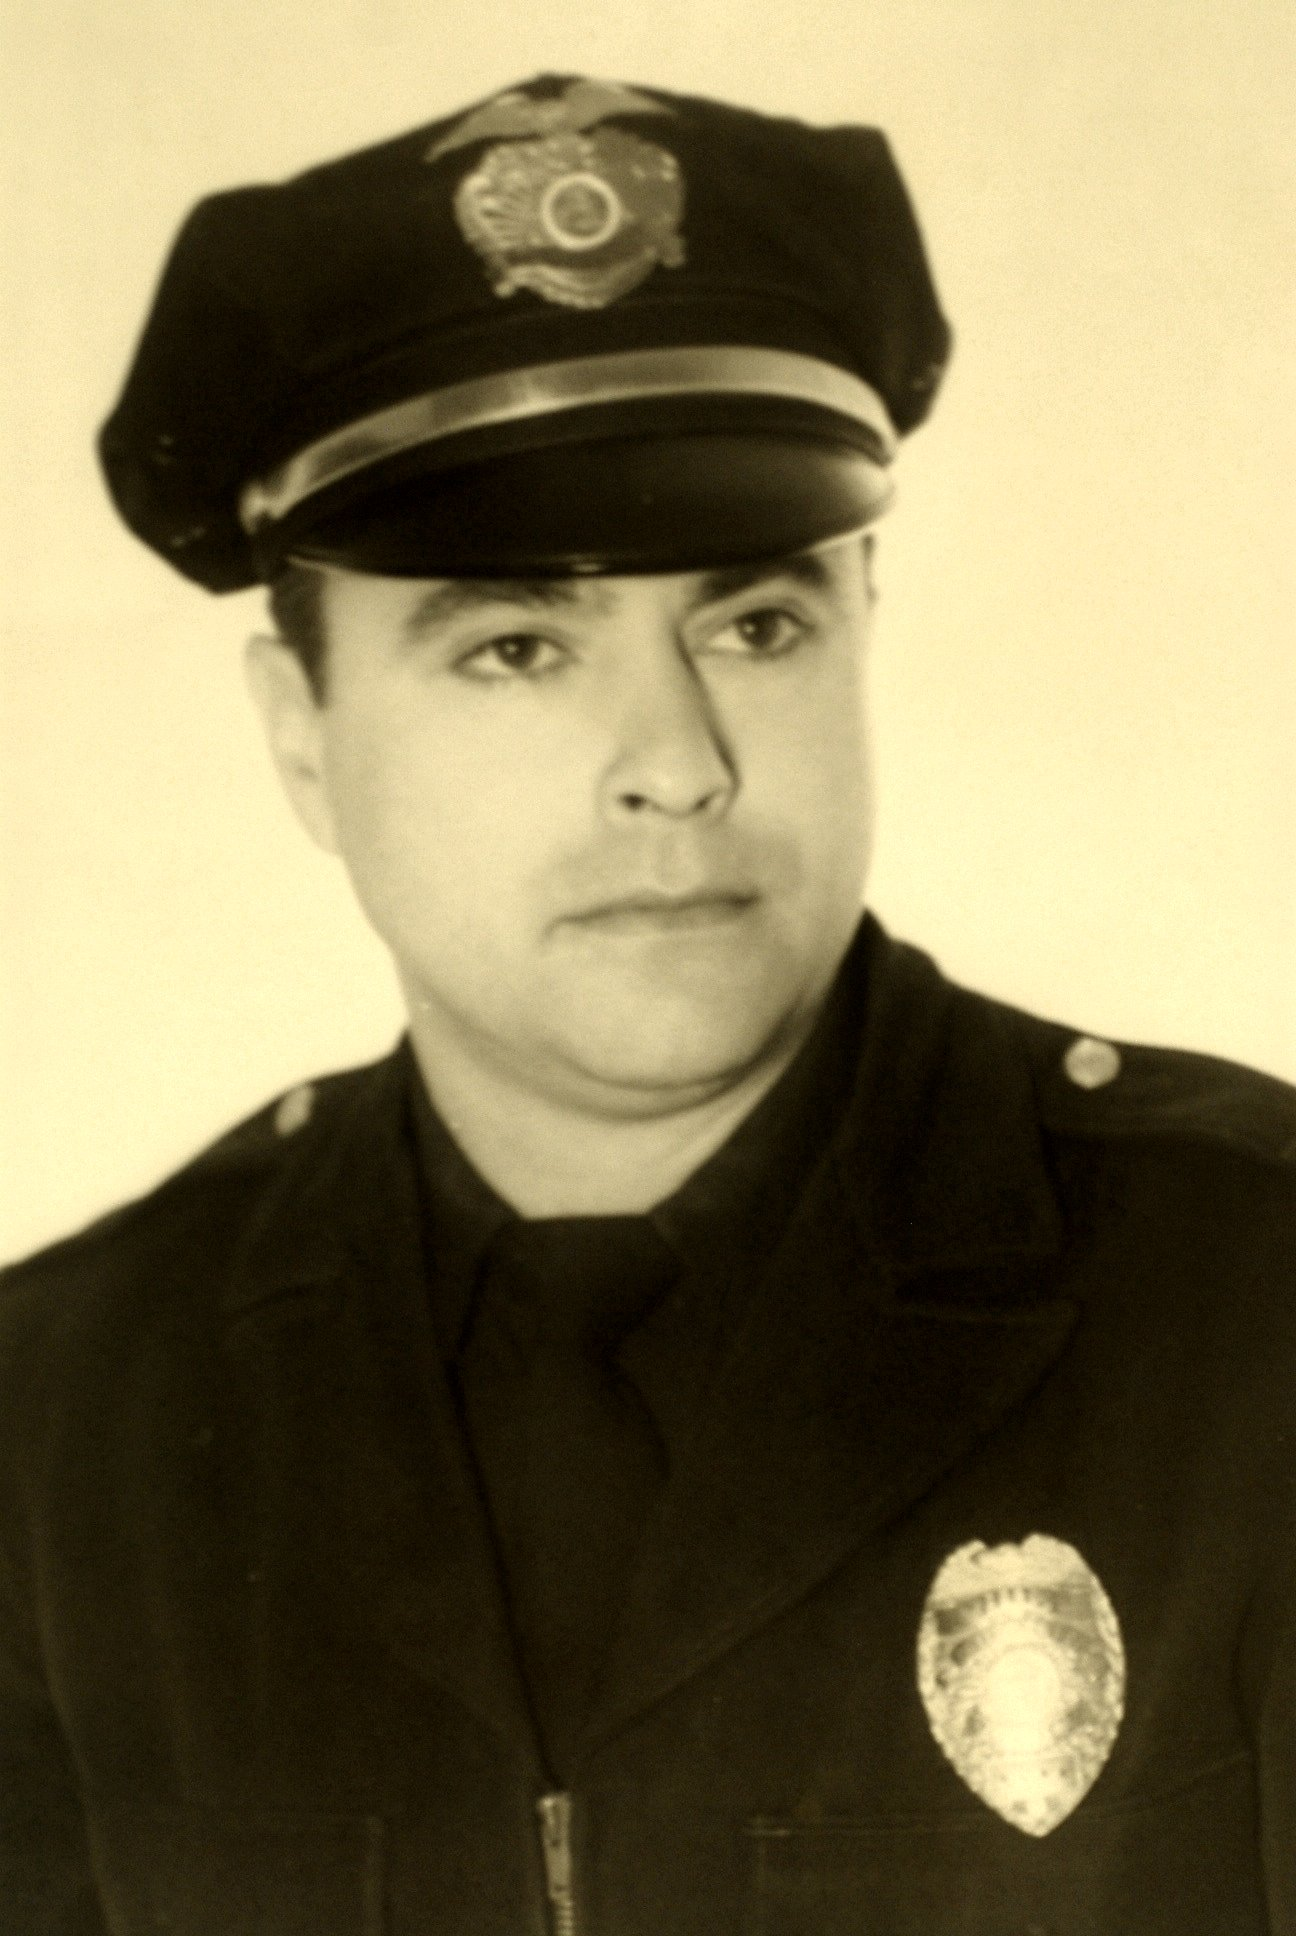 Louis Mountanos when he was police chief of Sausalito Photo courtesy of Sausalito Historical Society